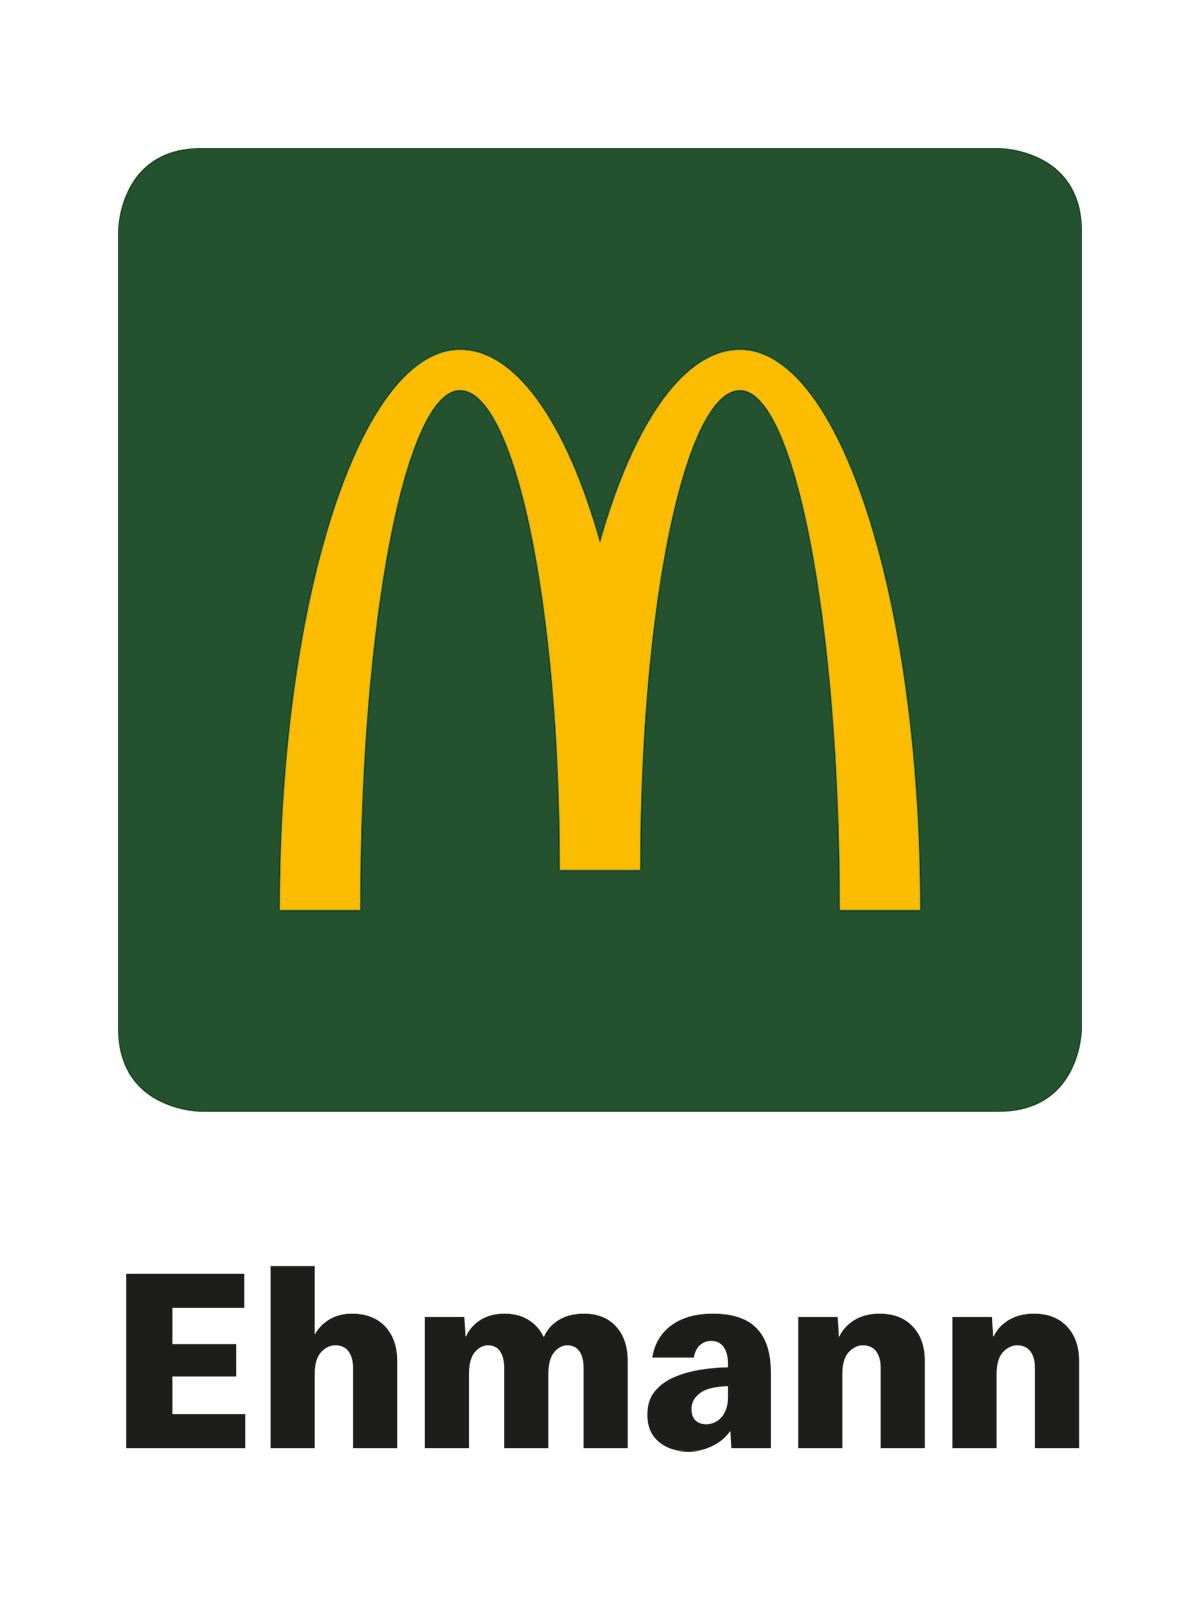 Willkommen bei McDonald's Ehmann